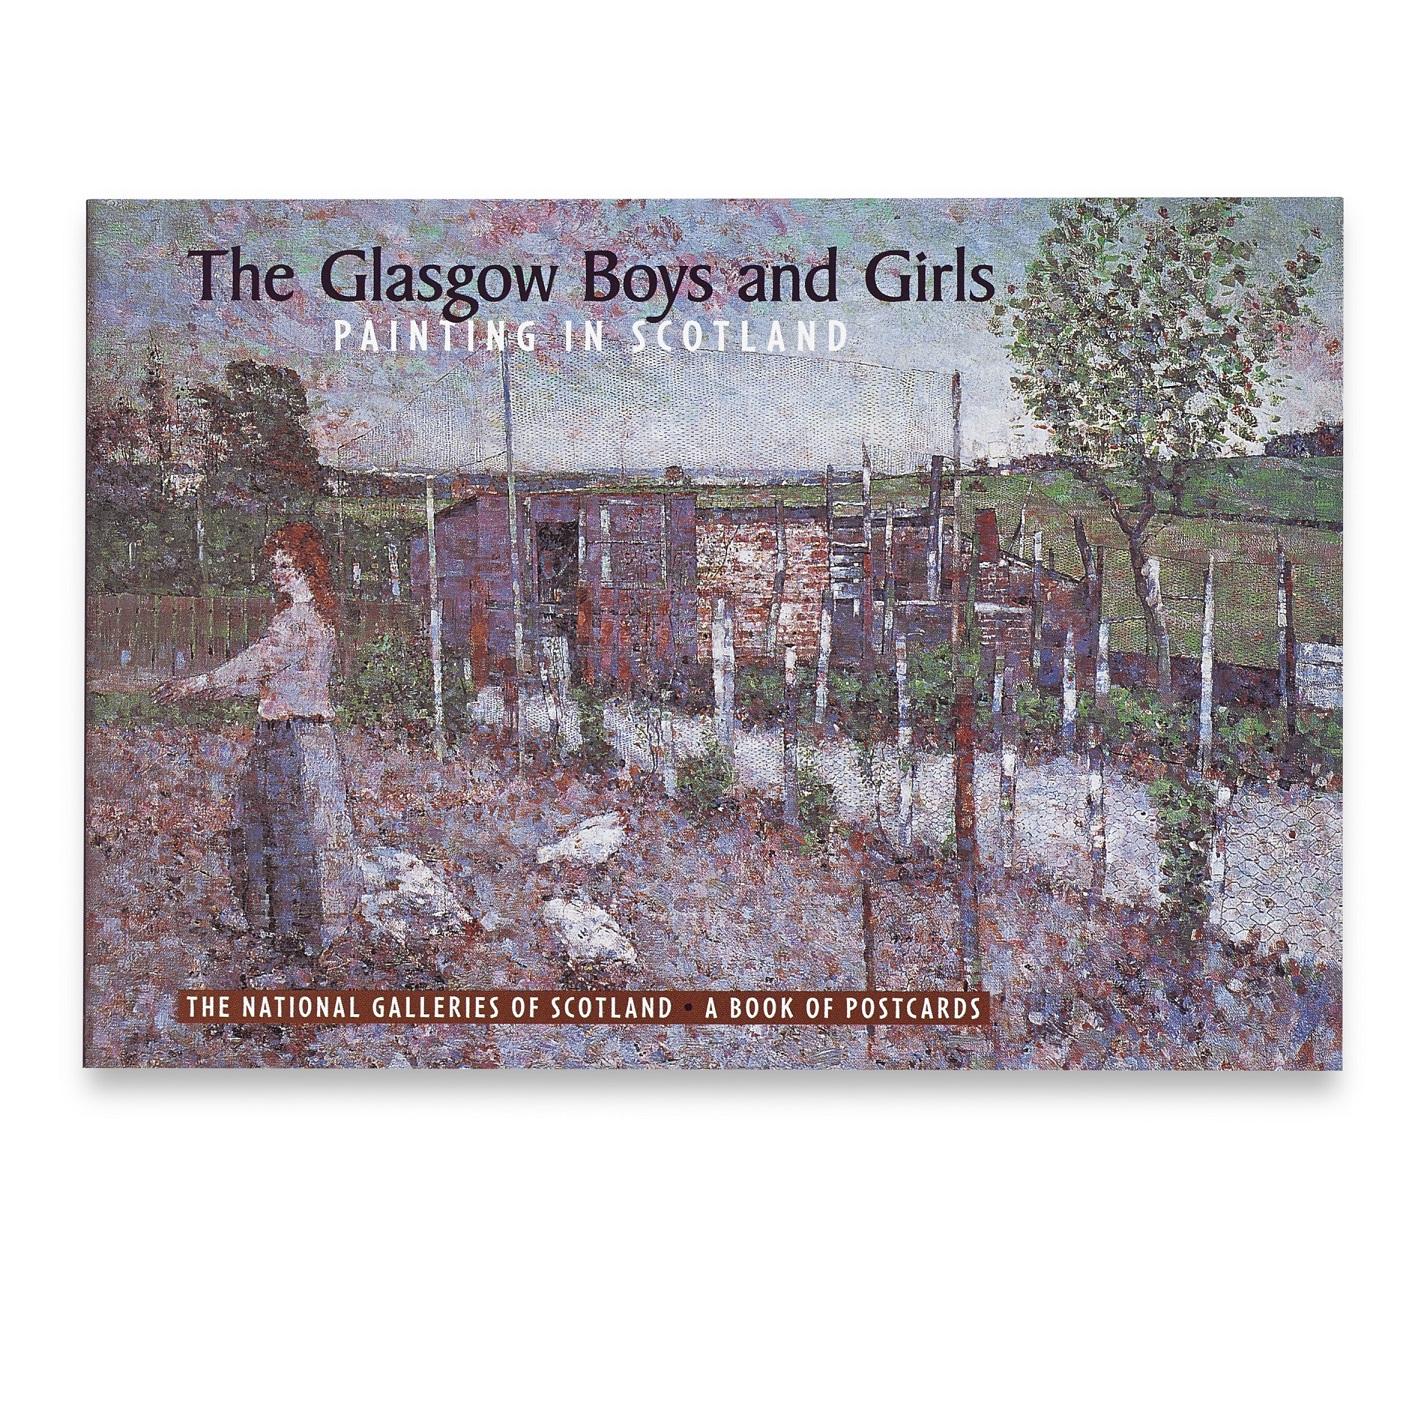 The Glasgow Boys & Girls Postcard Book